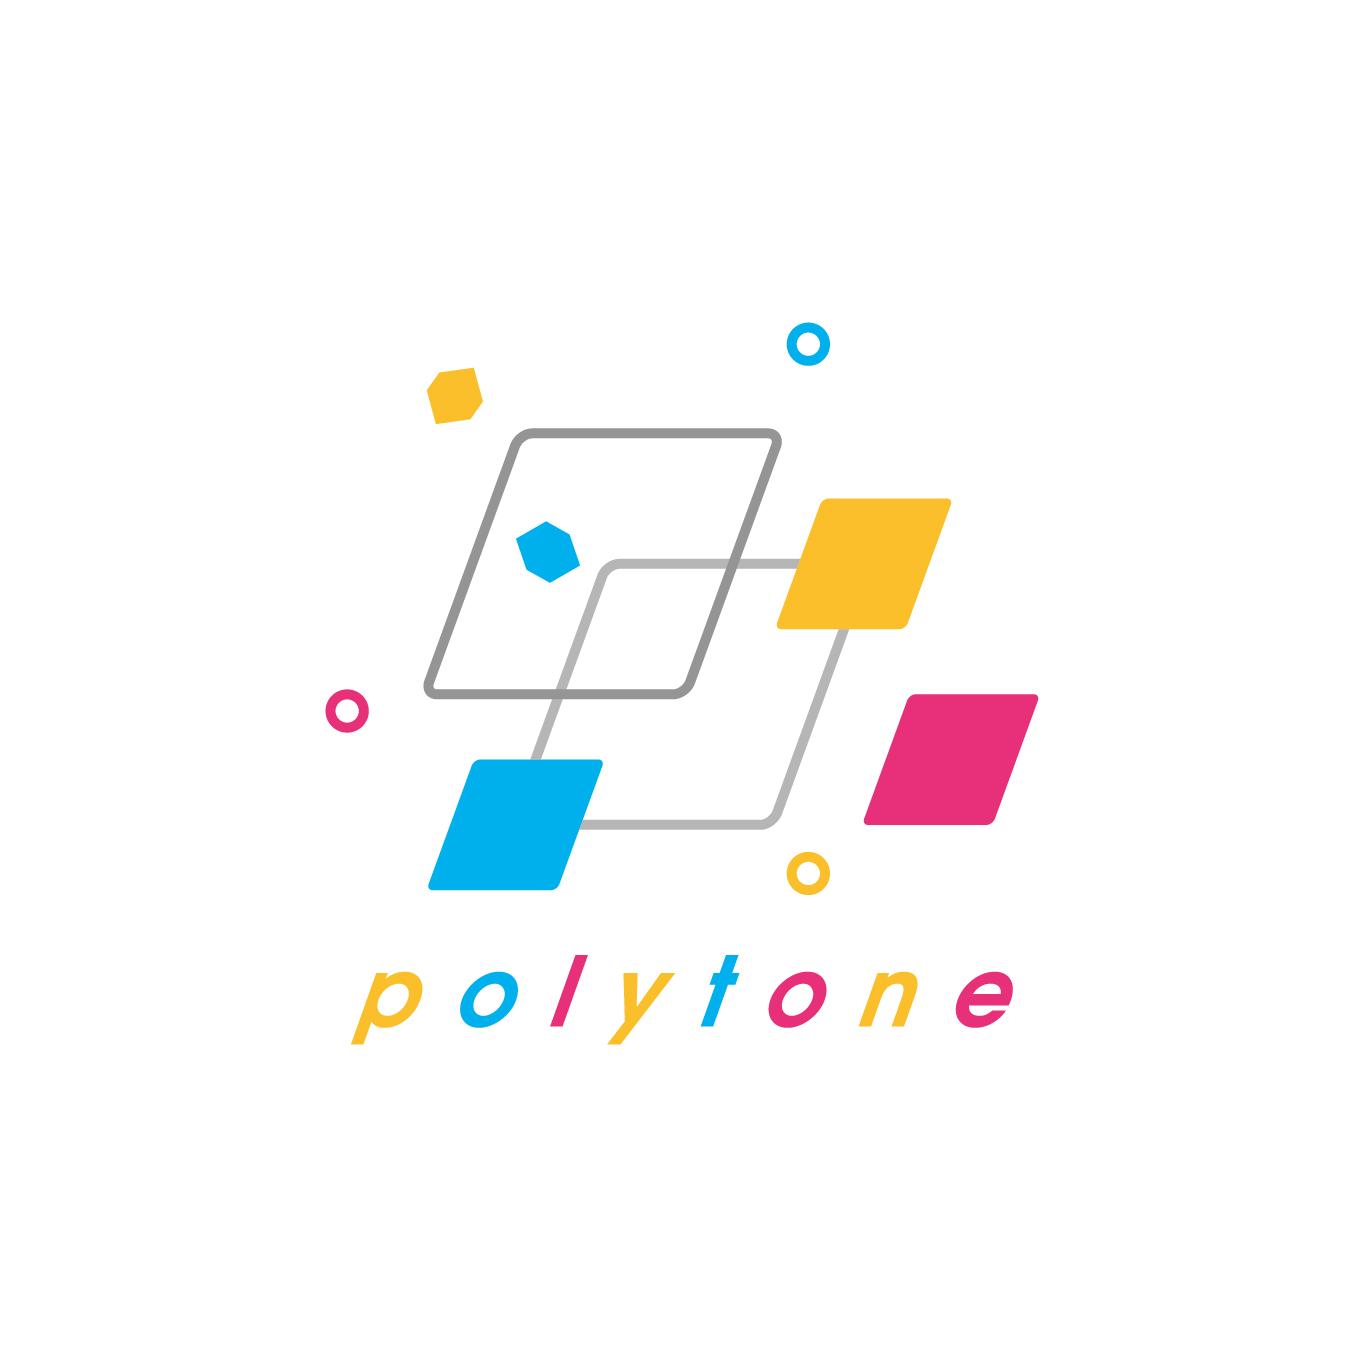 polytone-02